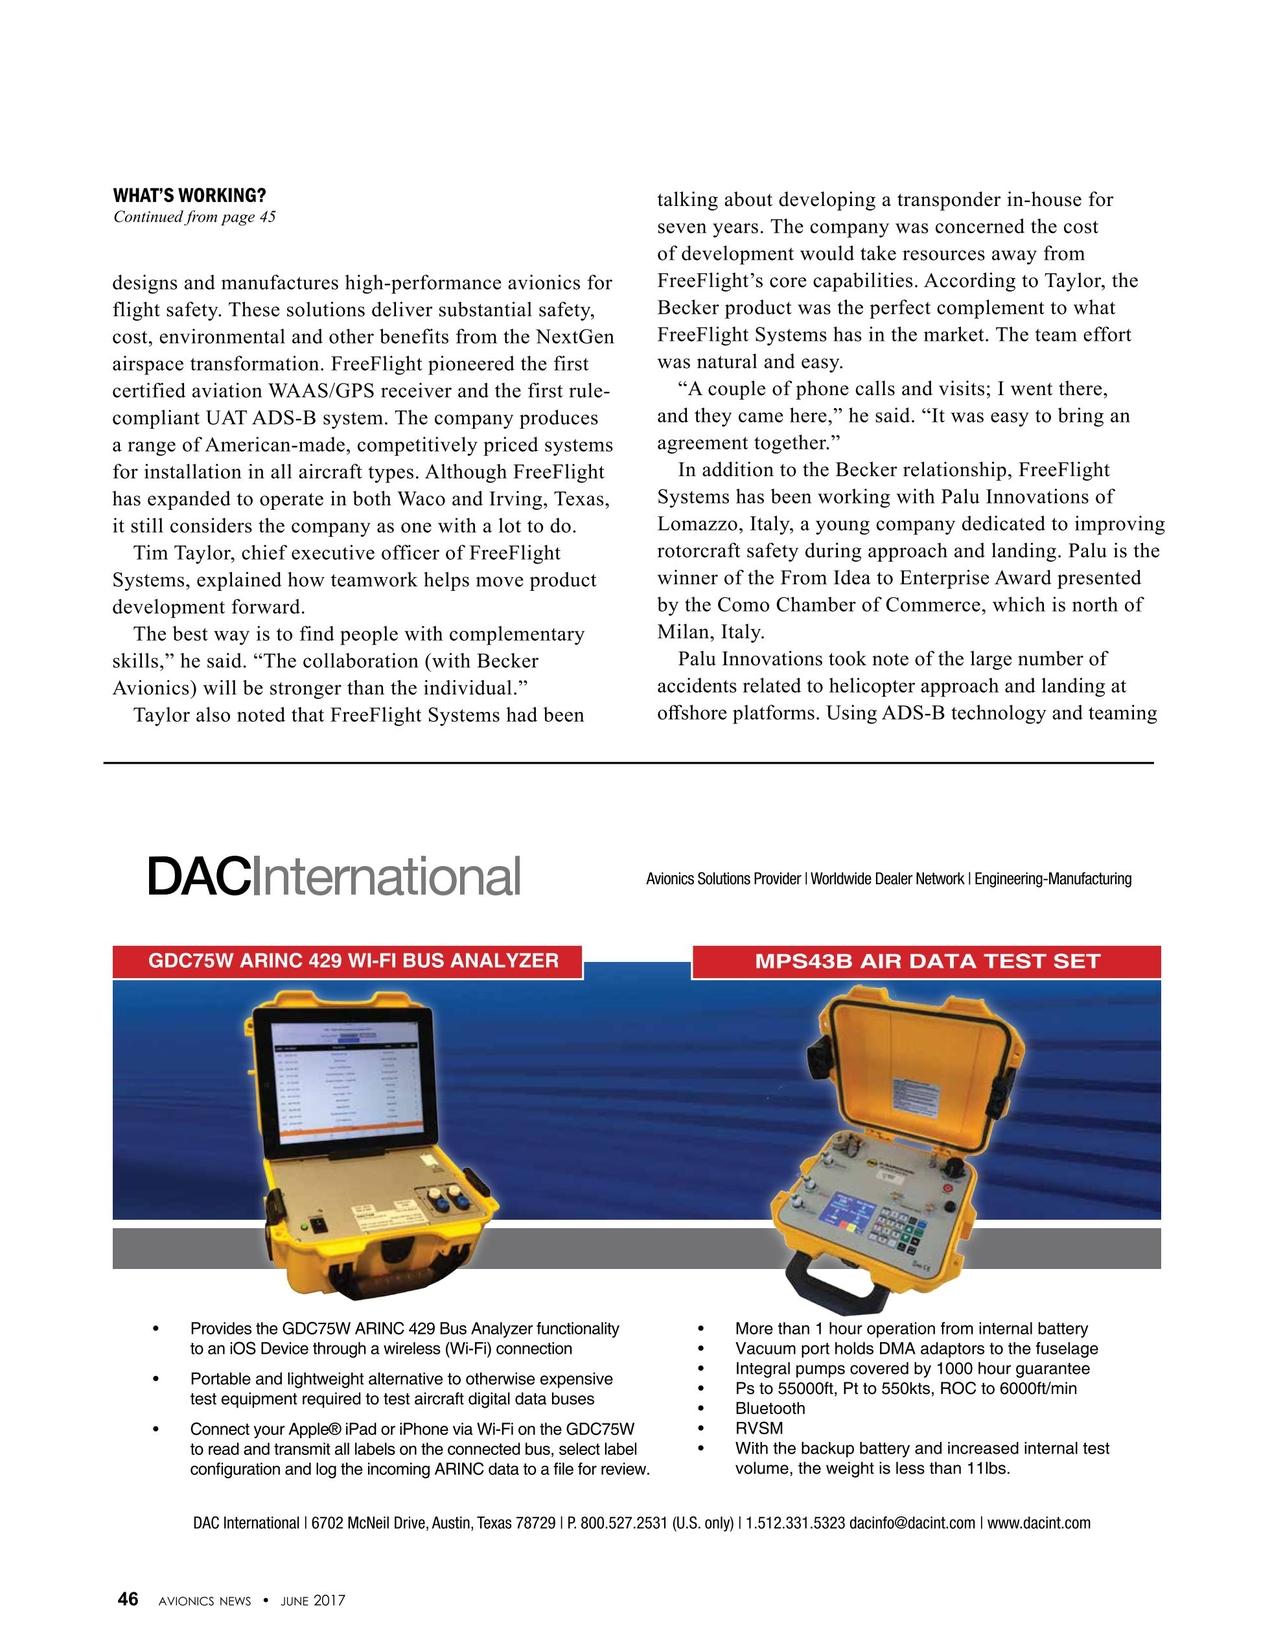 Avionics News June 2017